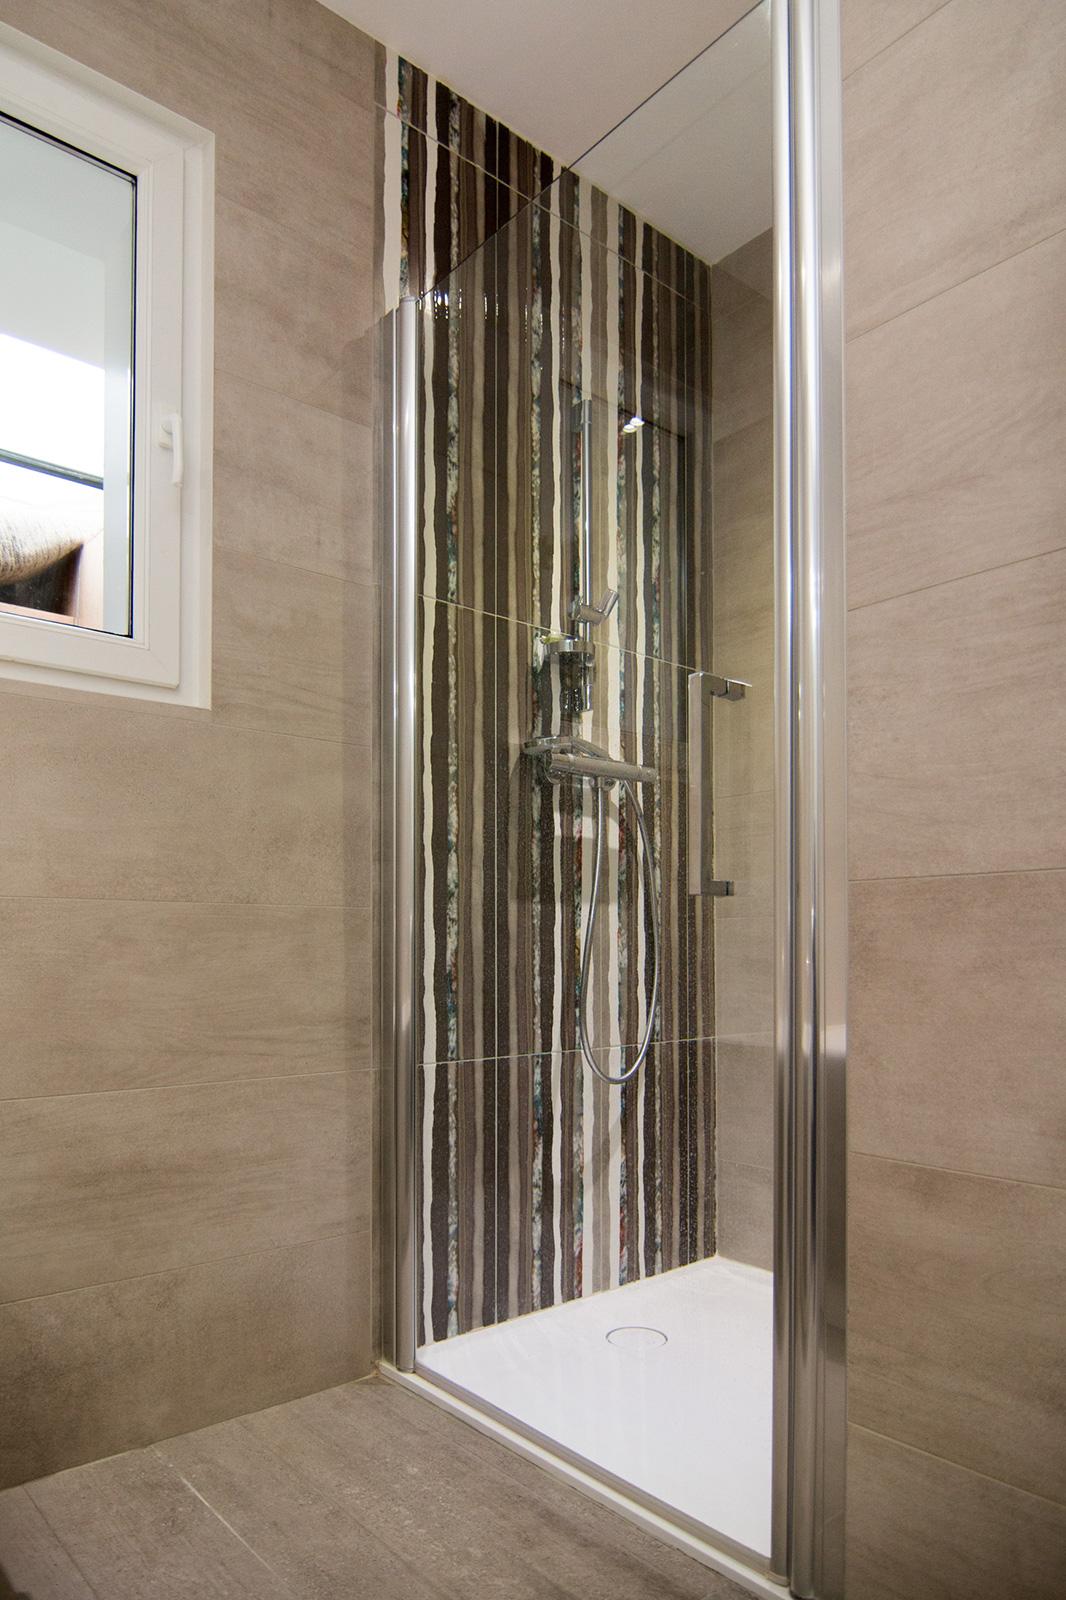 Installation de salles de bains neuves